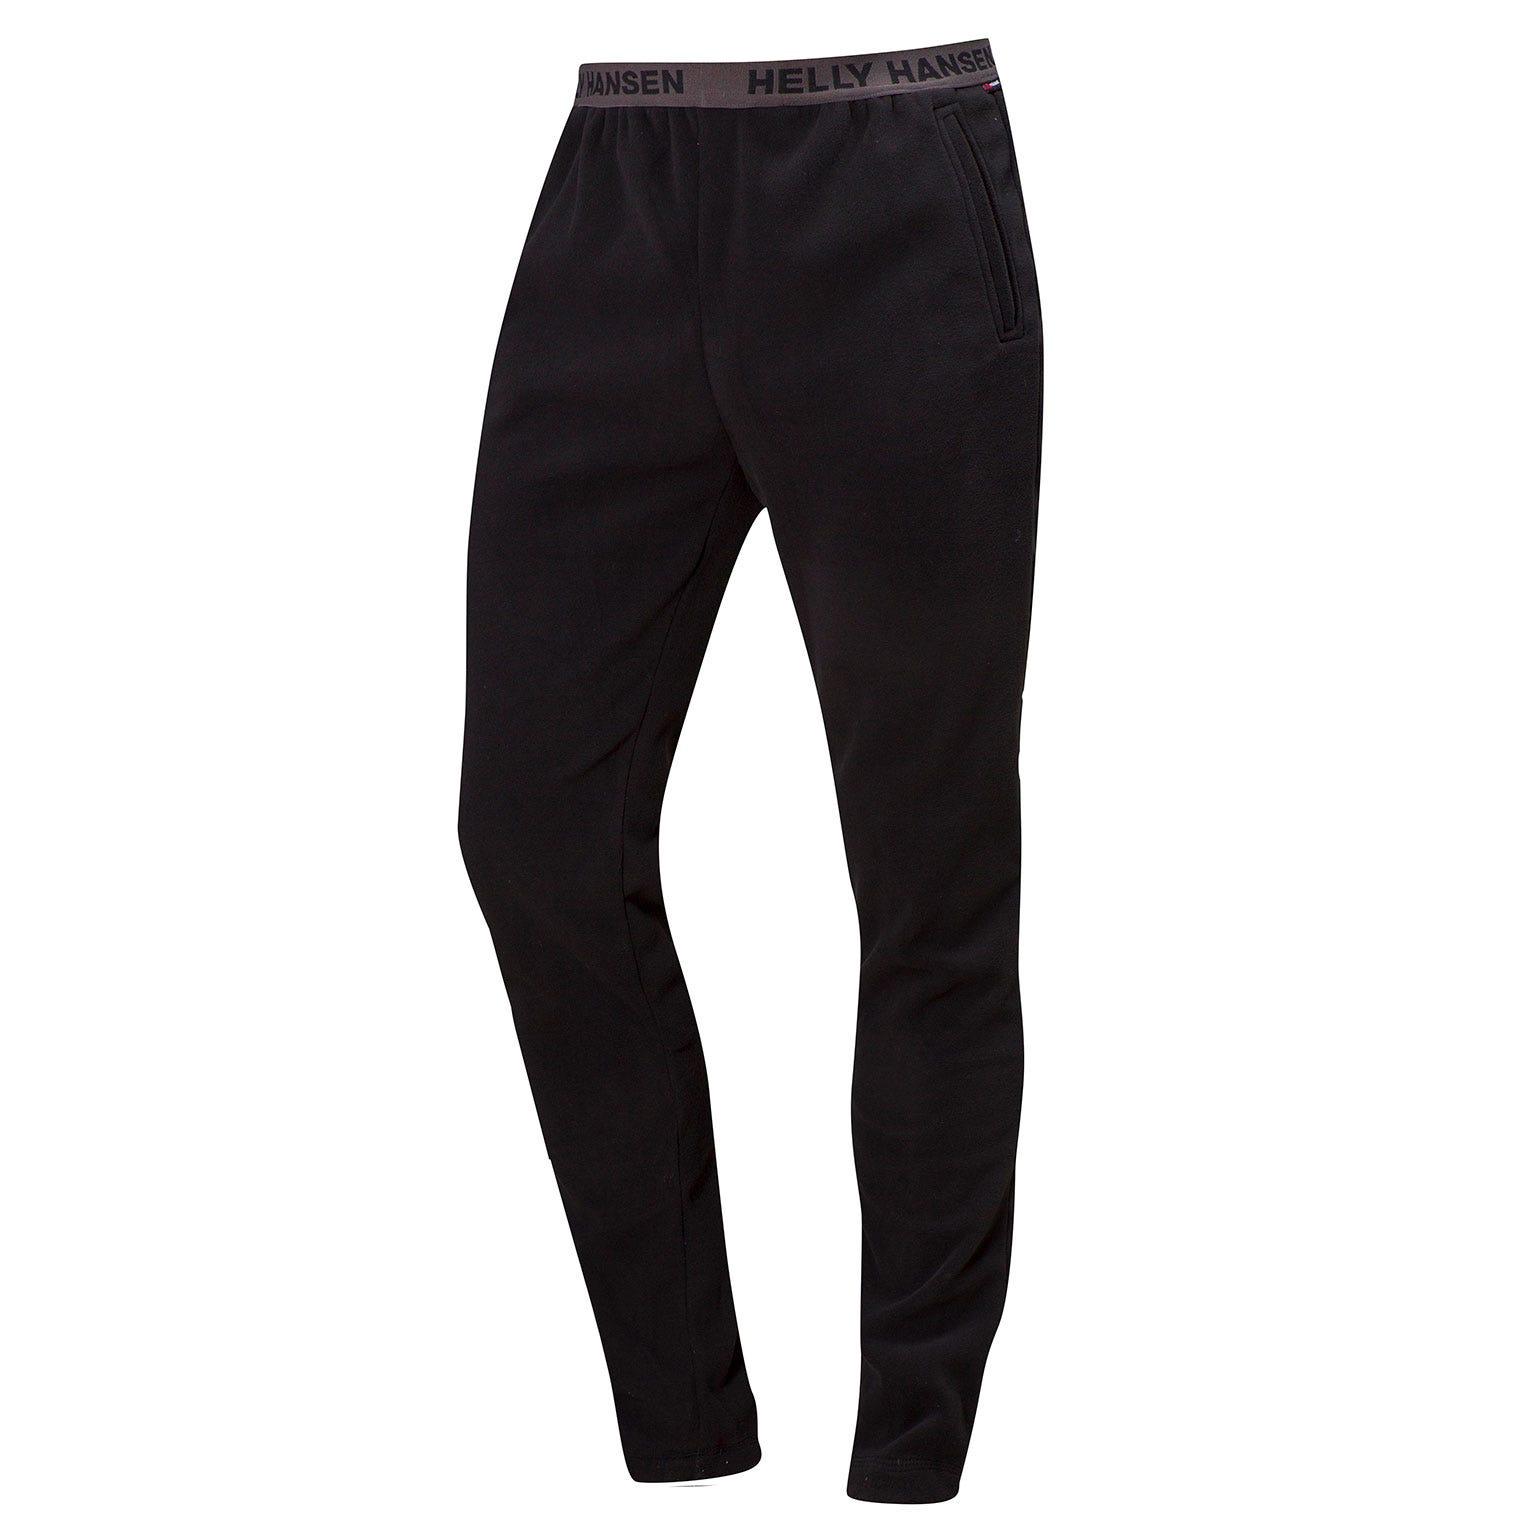 Helly Hansen Daybreaker Fleece Pant Mens Black S